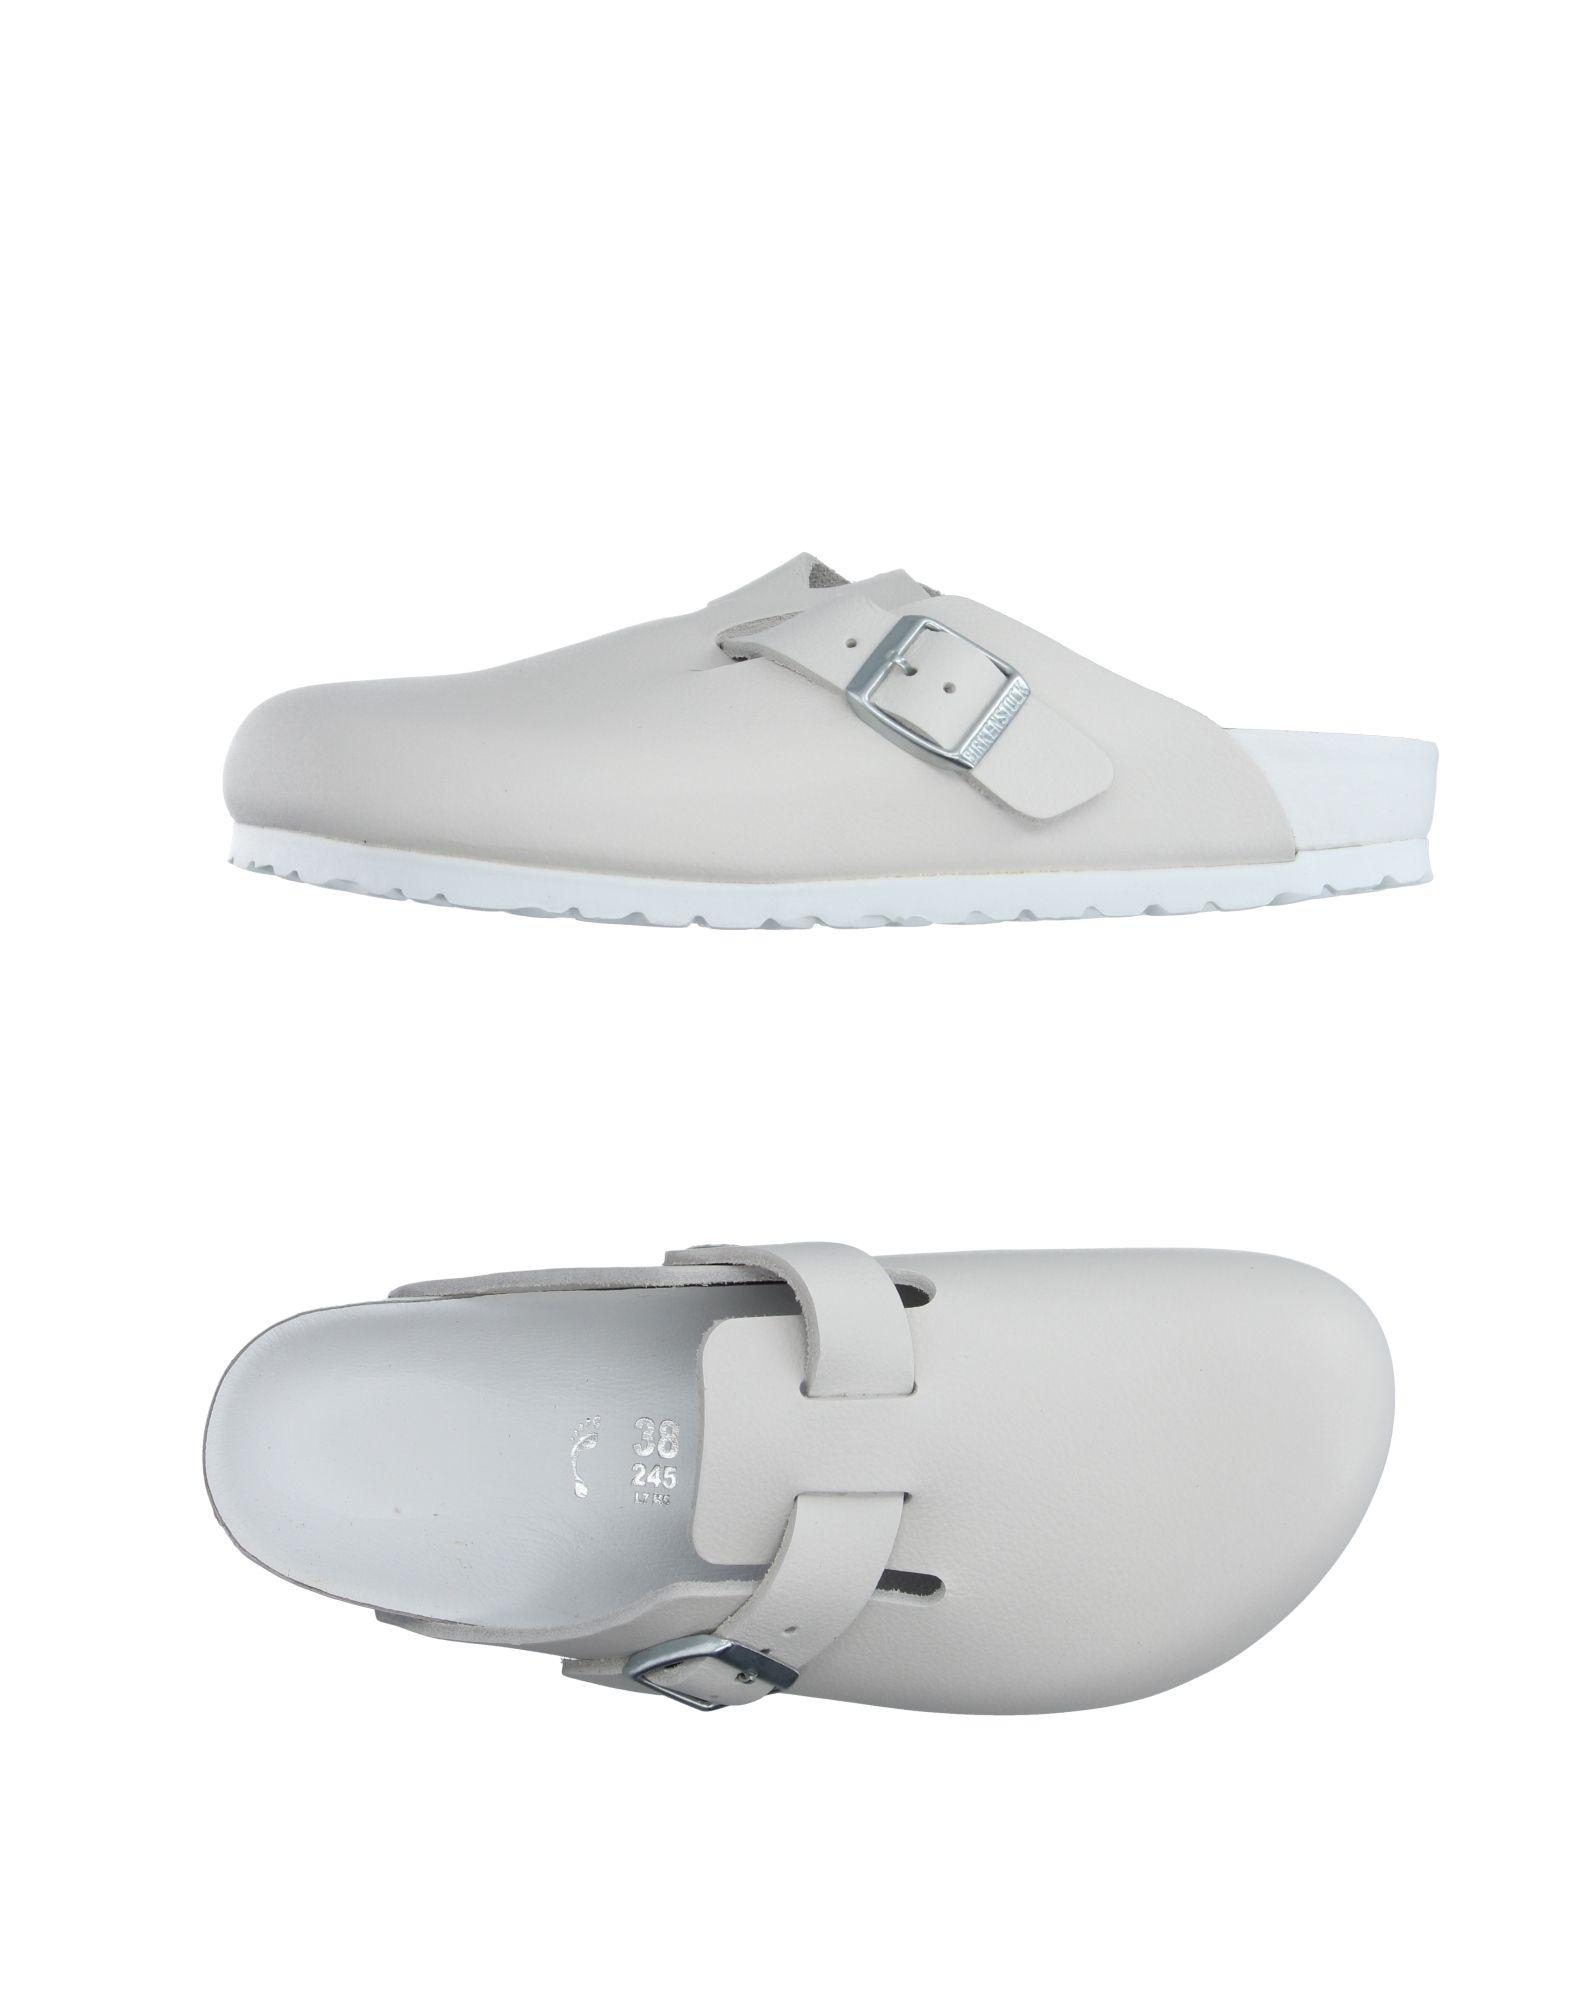 BIRKENSTOCK Damen Mules & Clogs Farbe Weiß Größe 9